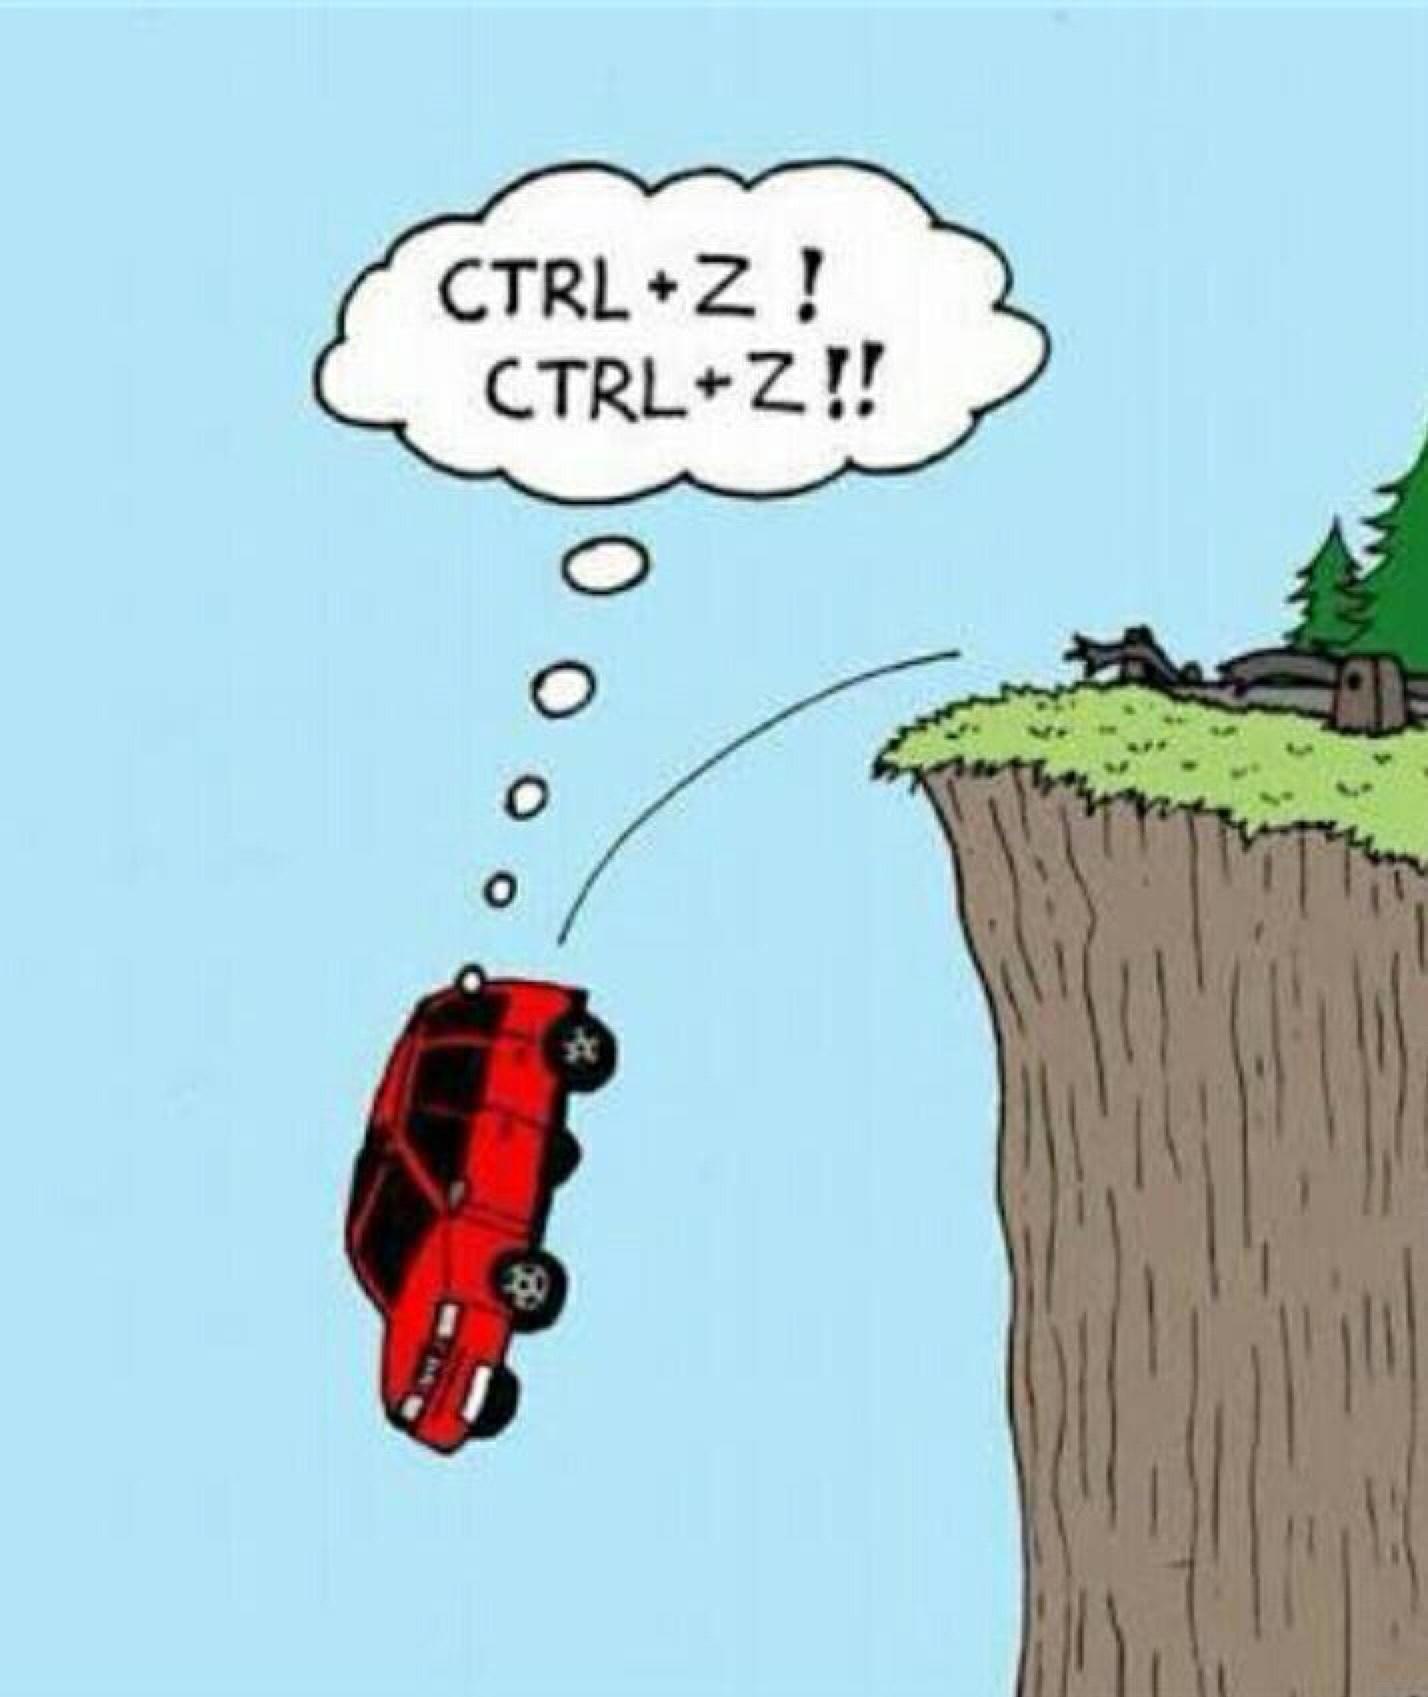 ctrl+alt+suppr. - meme